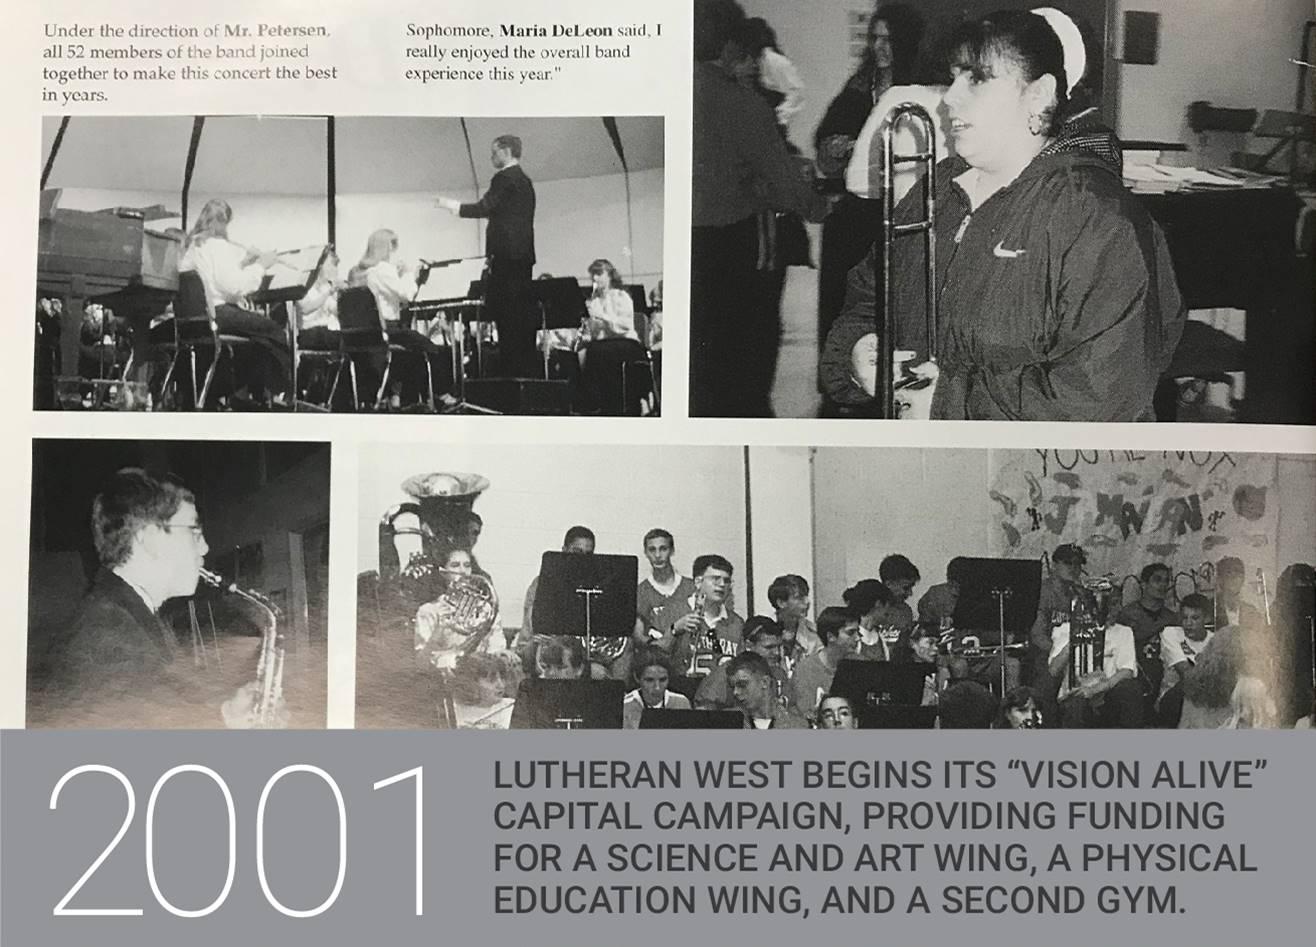 History-2001-Vision-Alive-Campaign